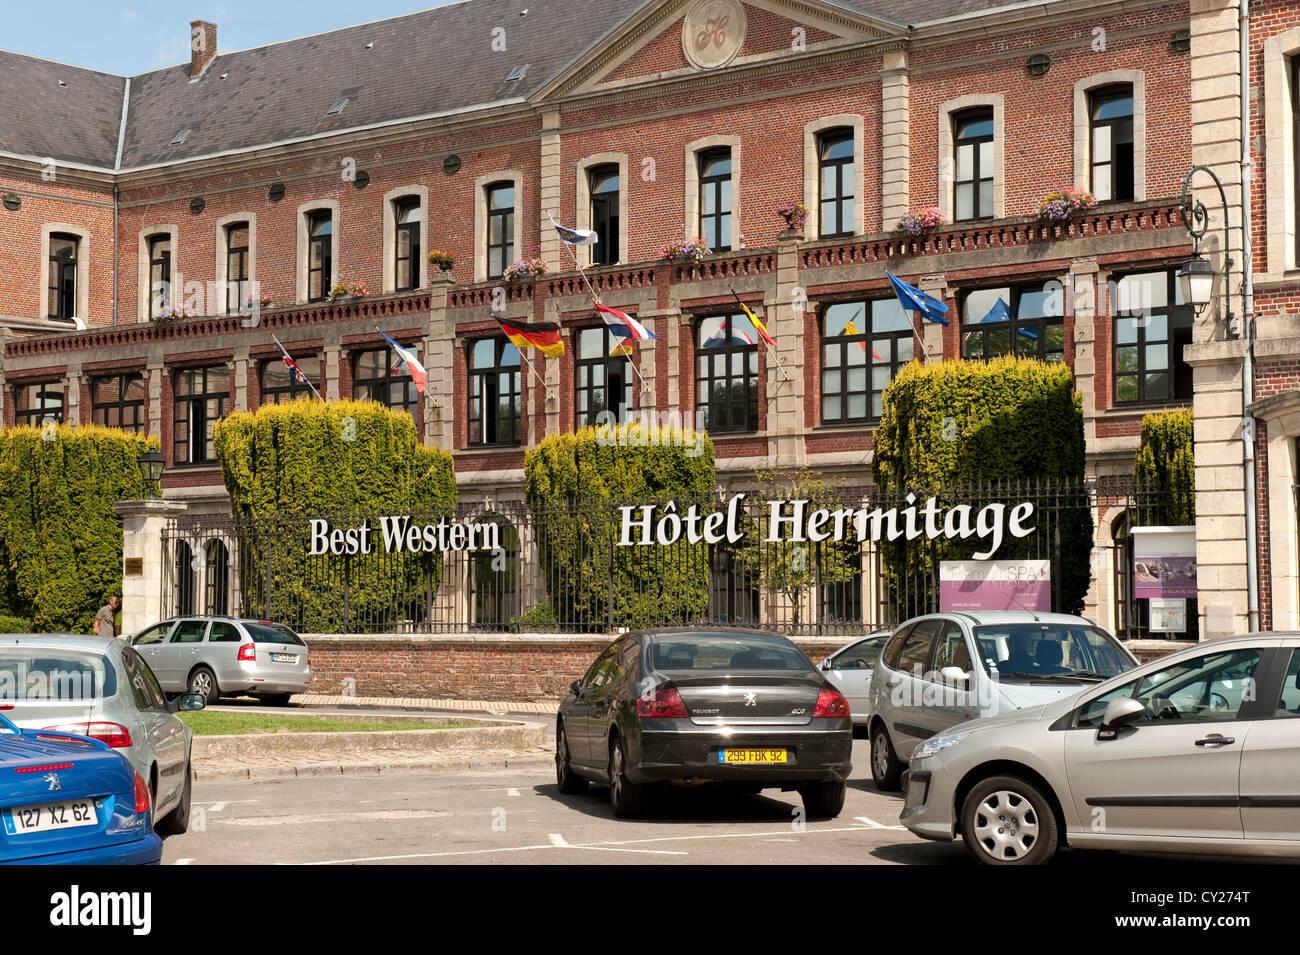 Best Western Hotel Hermitage France